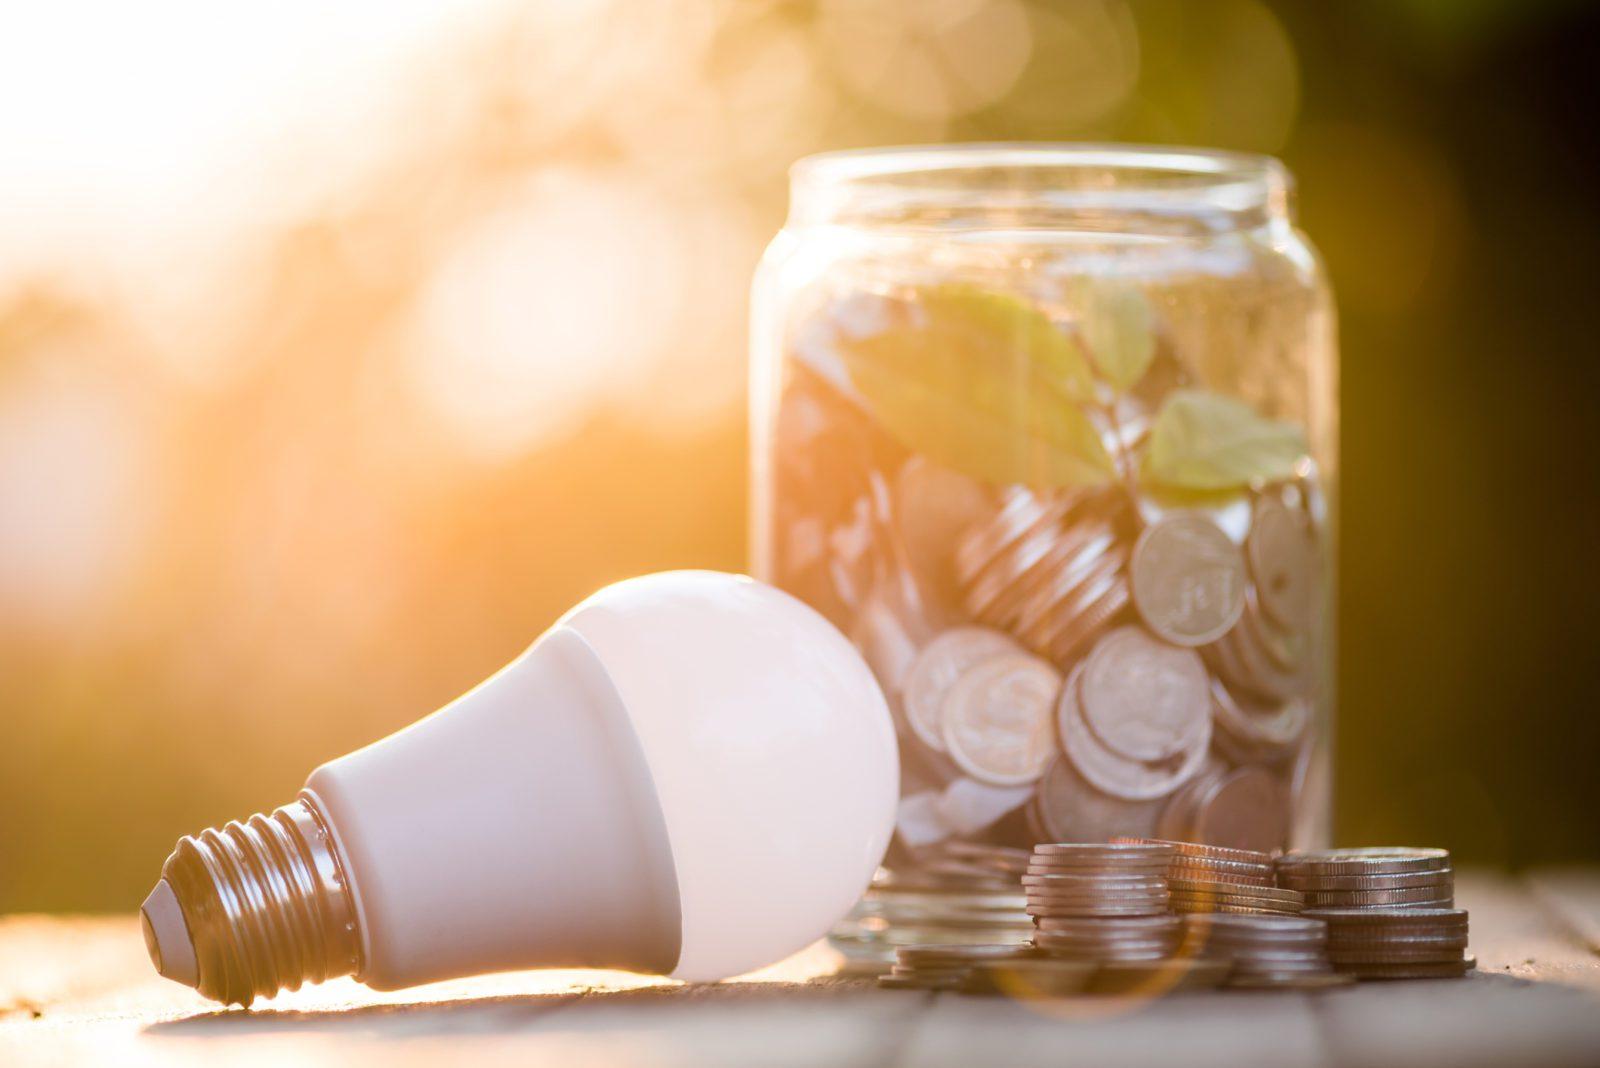 Energy Savings LED Bulb with a jar full of change